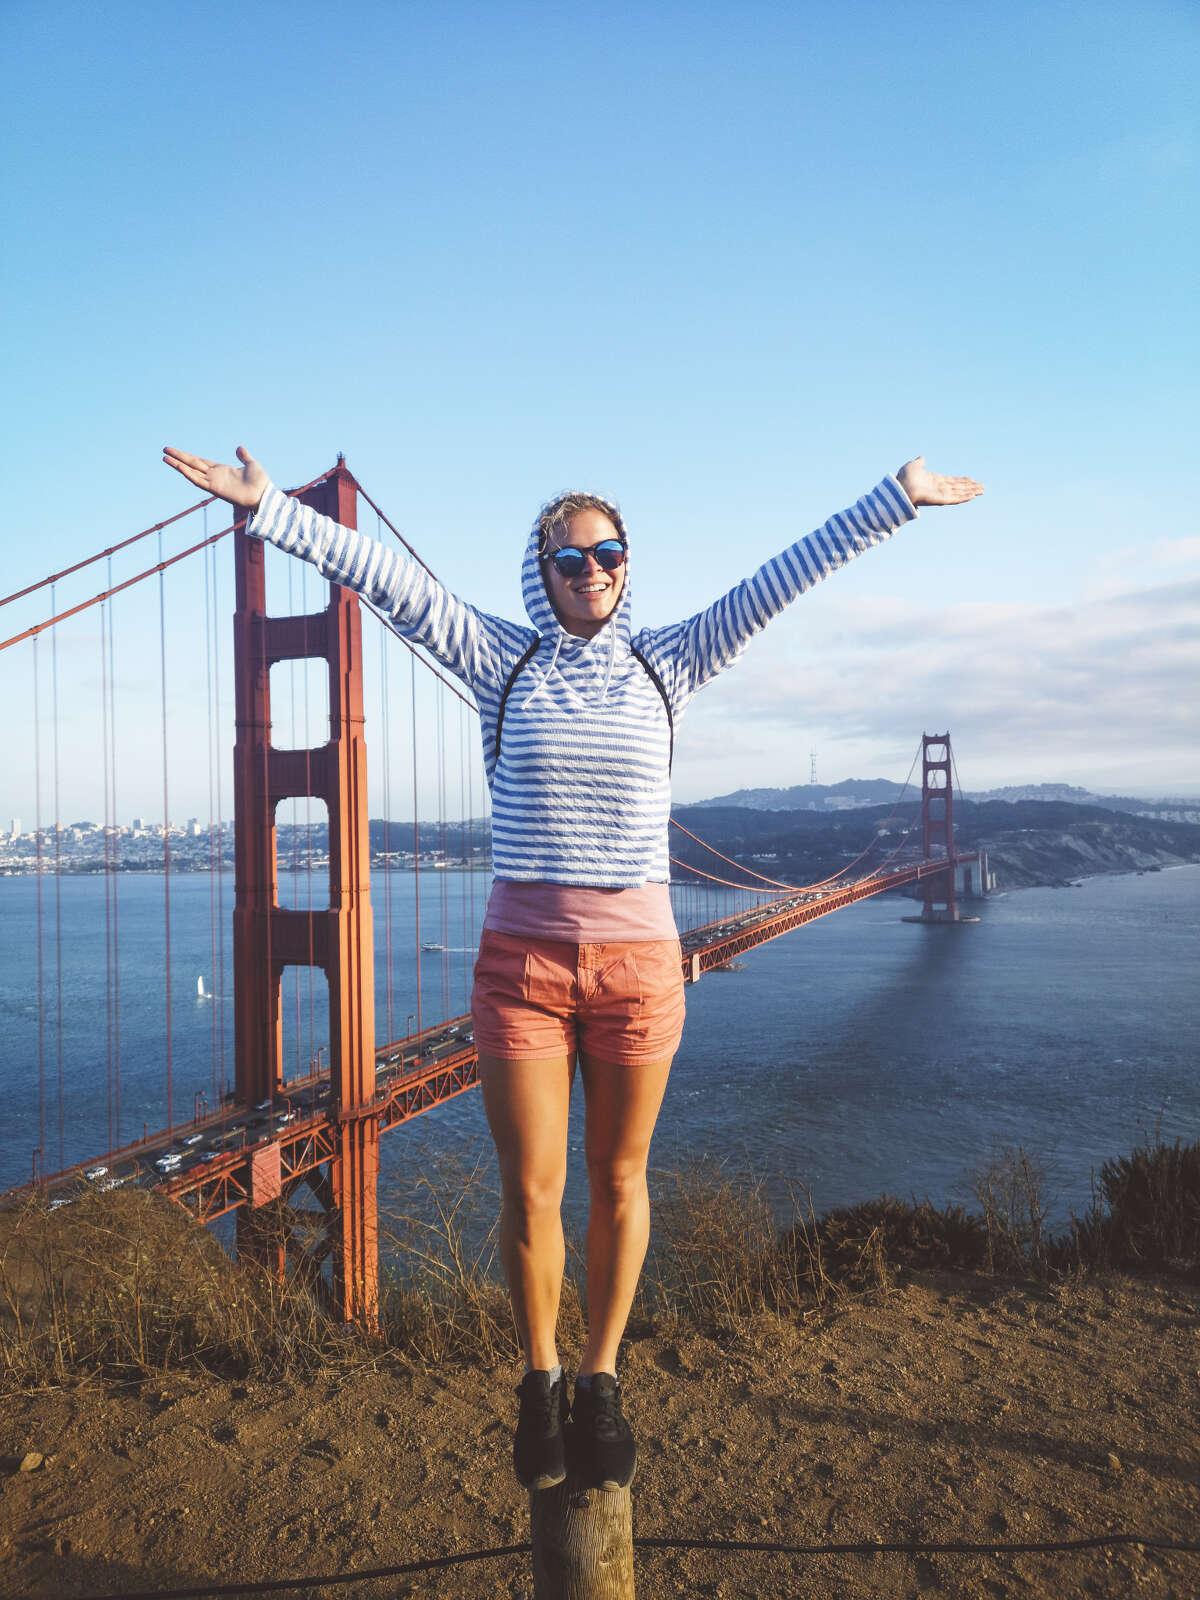 Hernandez on why this stock Golden Gate Bridge photo works: